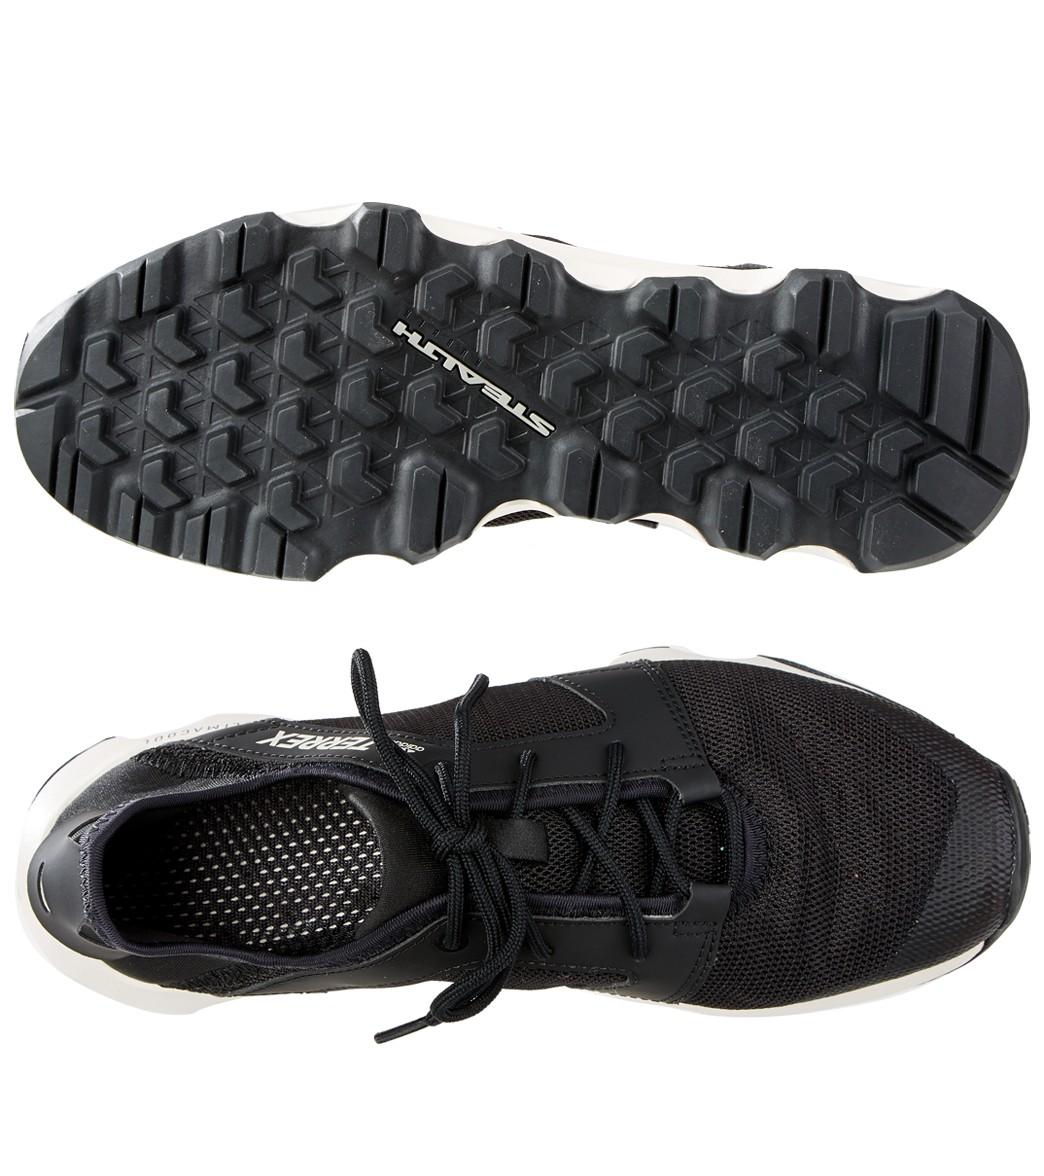 Adidas Women s Terrex Climacool Voyager Sleek Water Shoe at ... 9843adc7eeab4